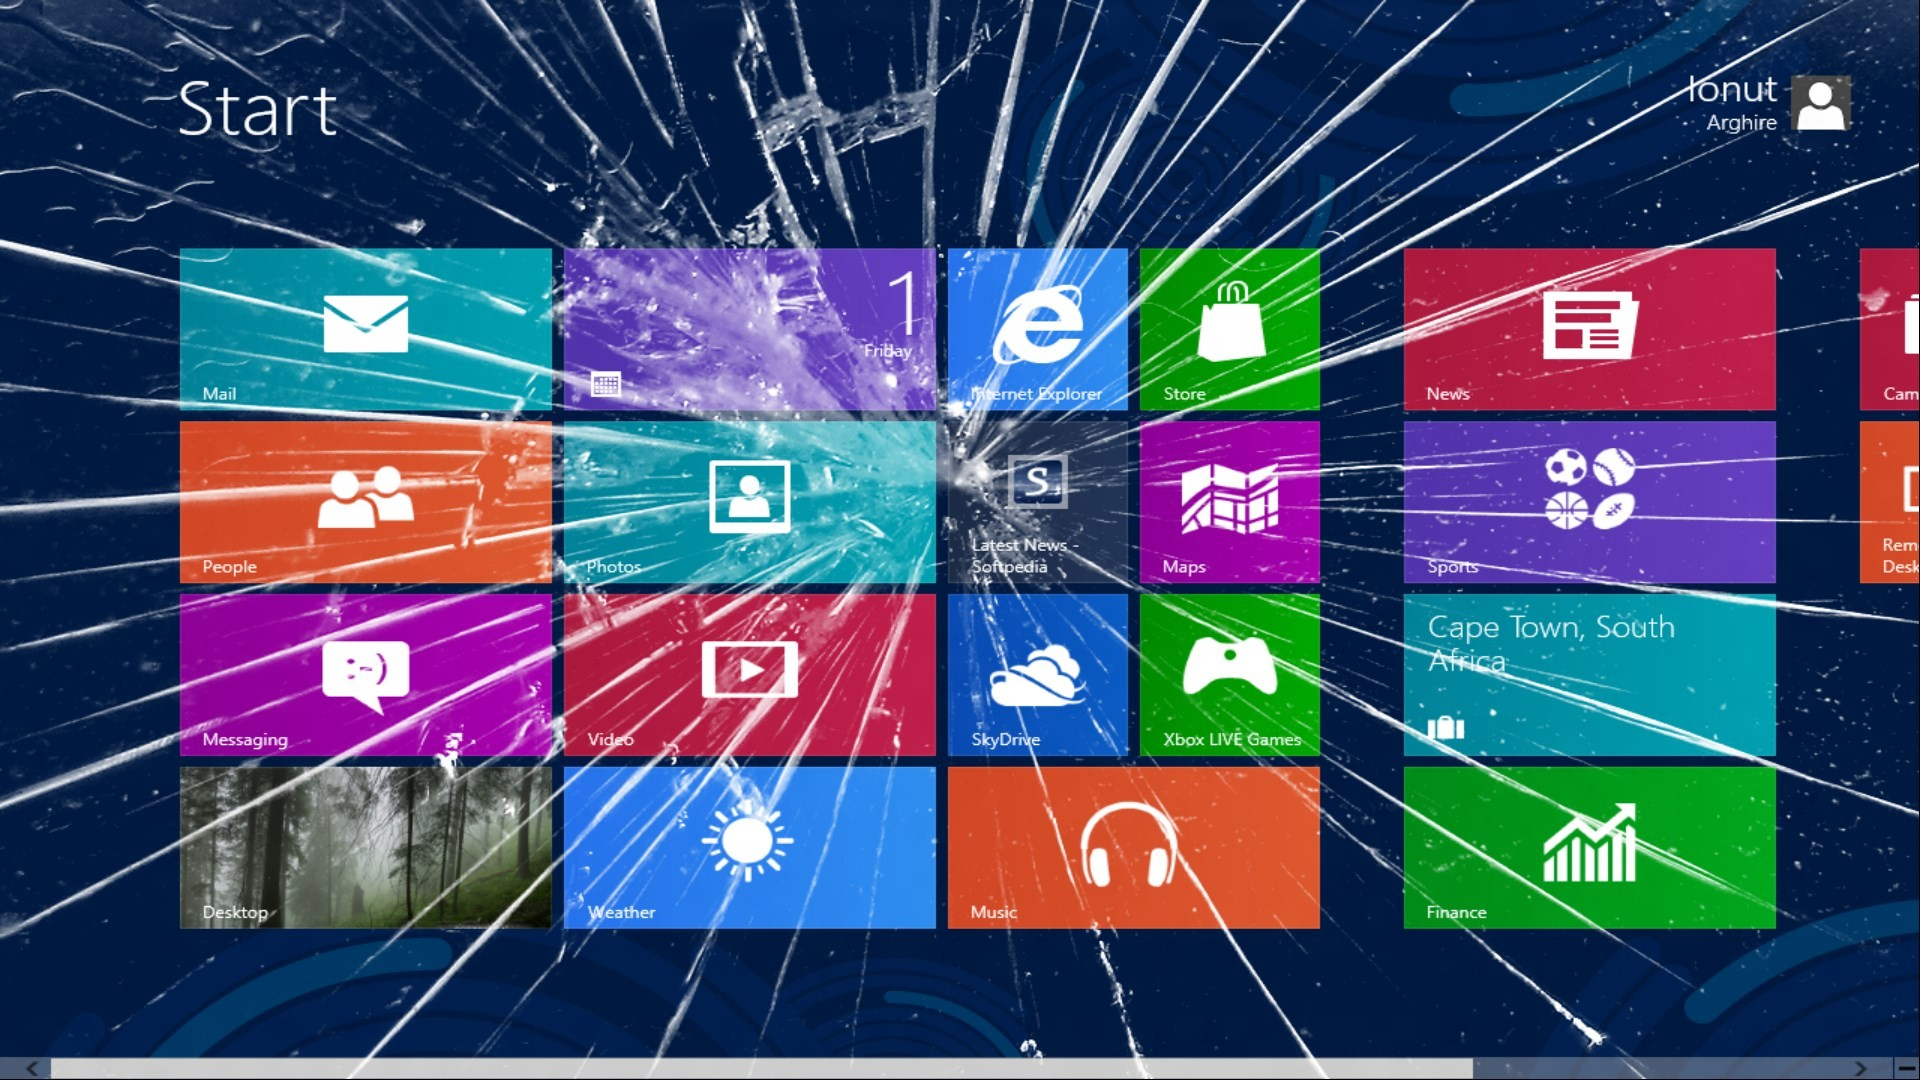 … broken screen wallpaper windows 8 2017 live wallpaper hd …